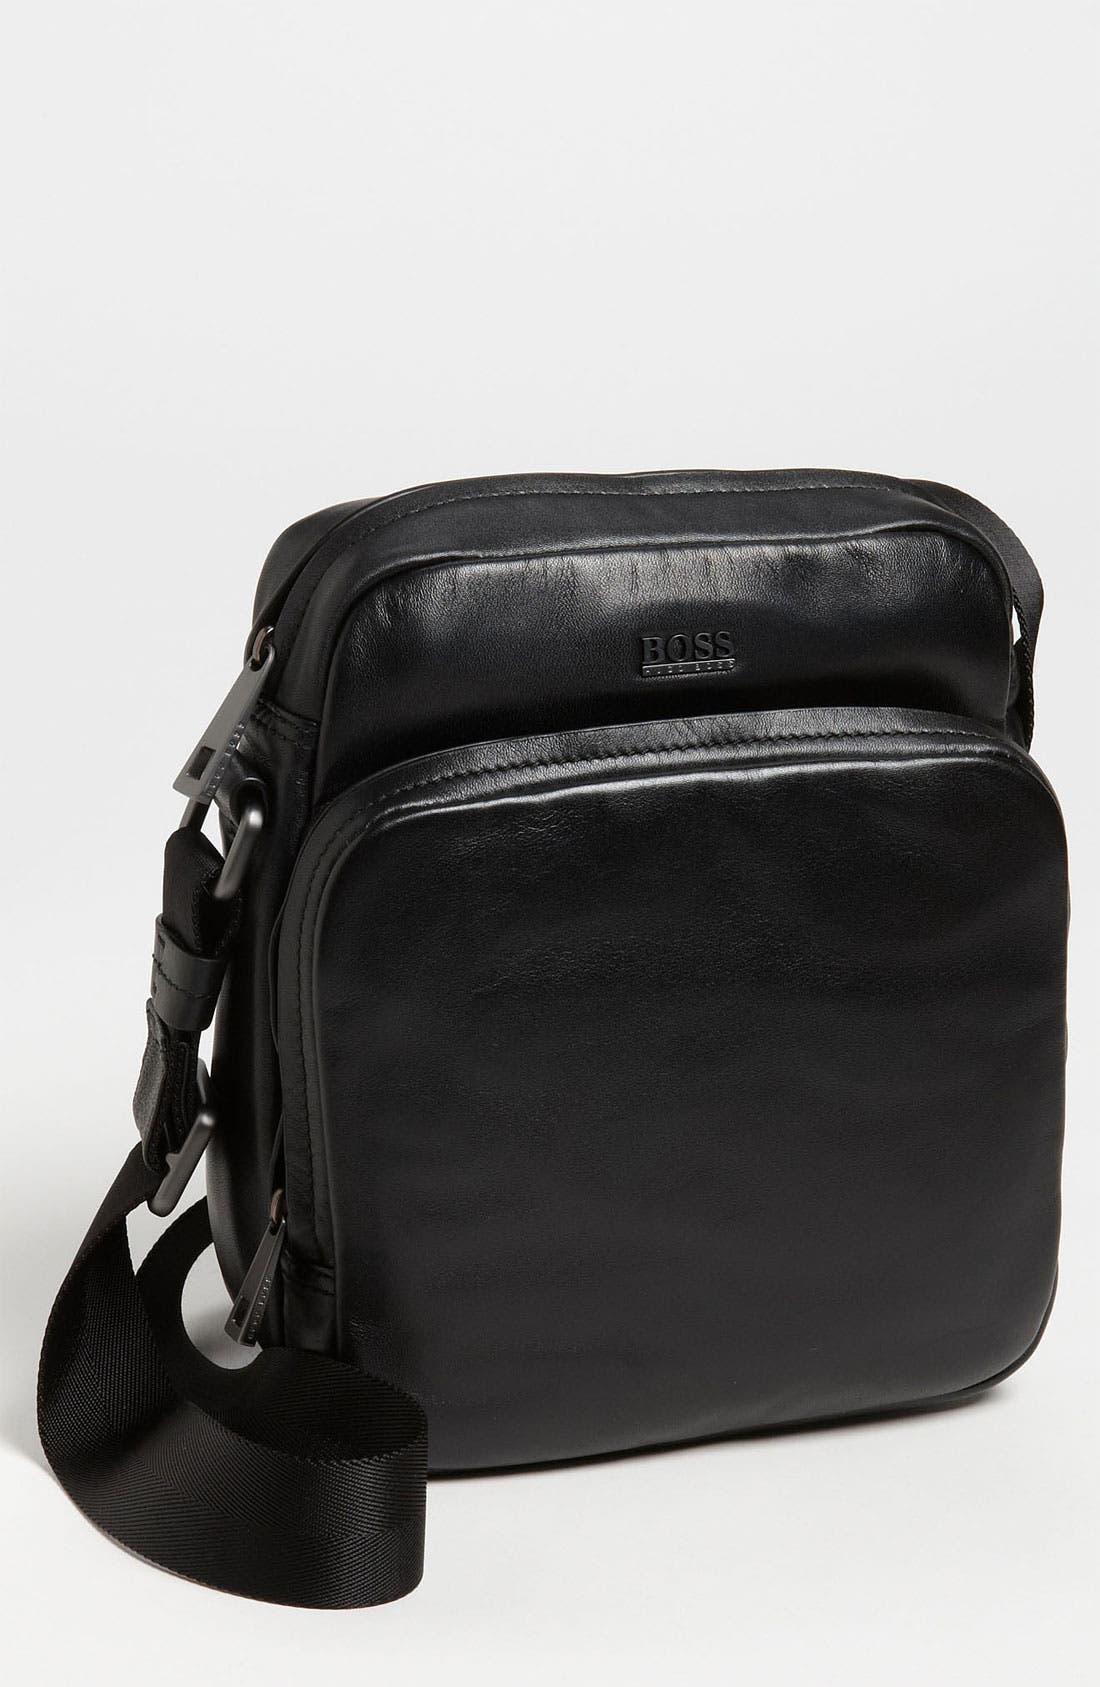 Main Image - BOSS Black 'Kunsty' Messenger Bag